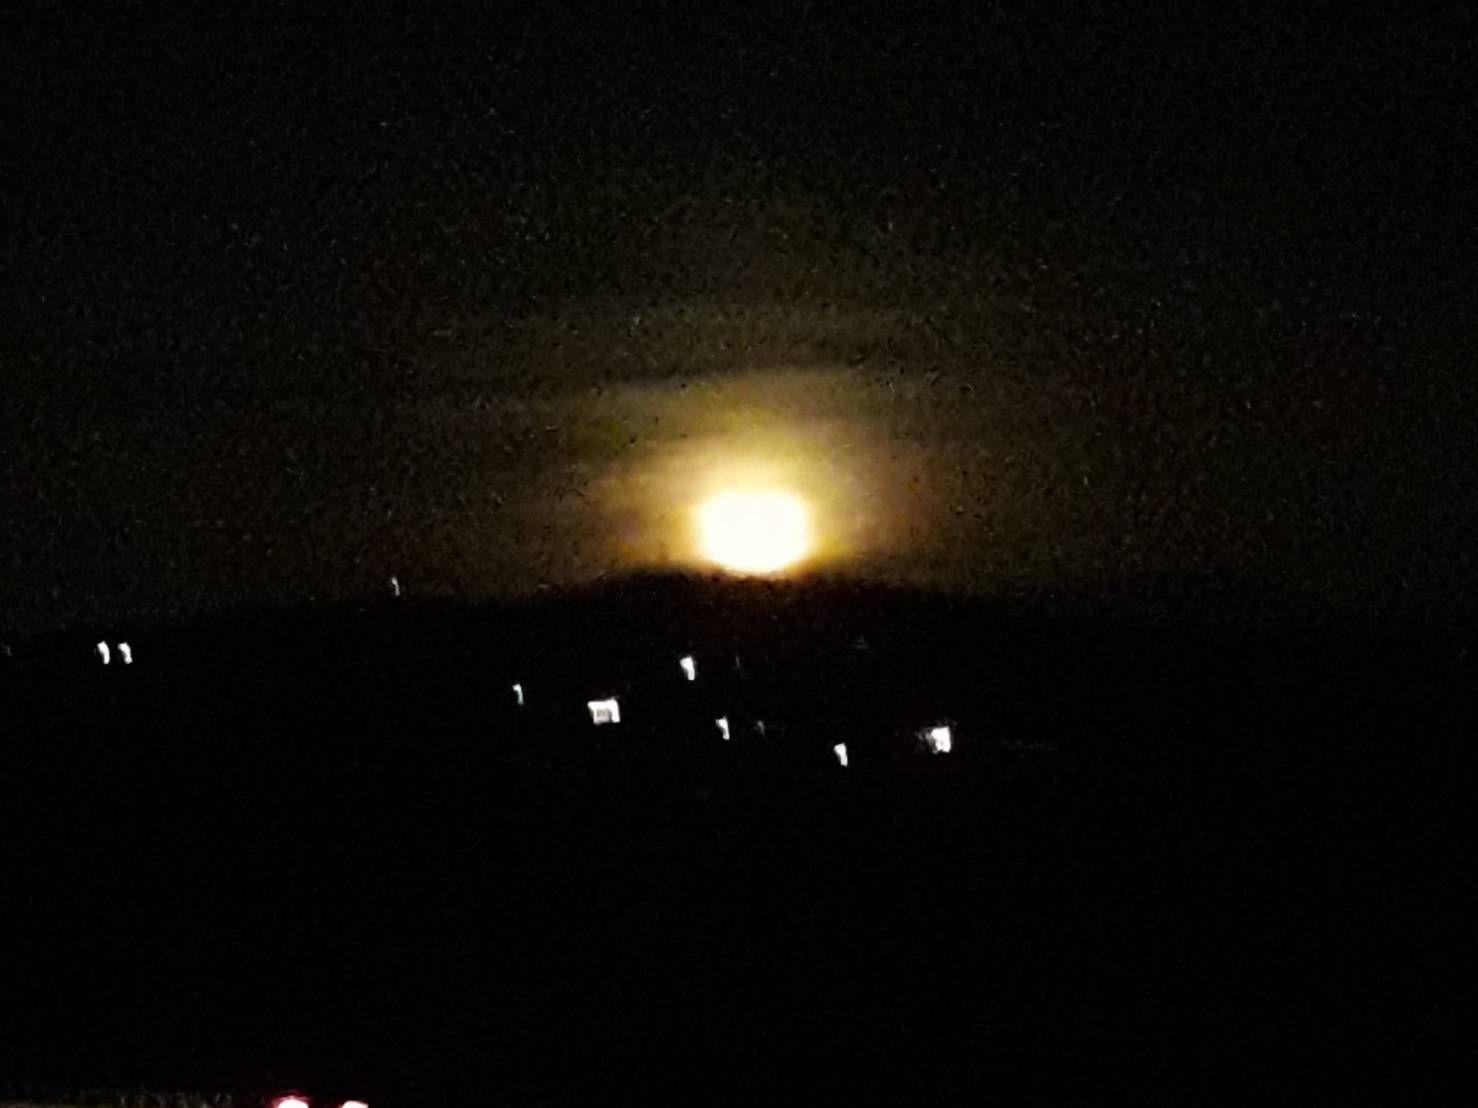 Pleine lune à la campagne